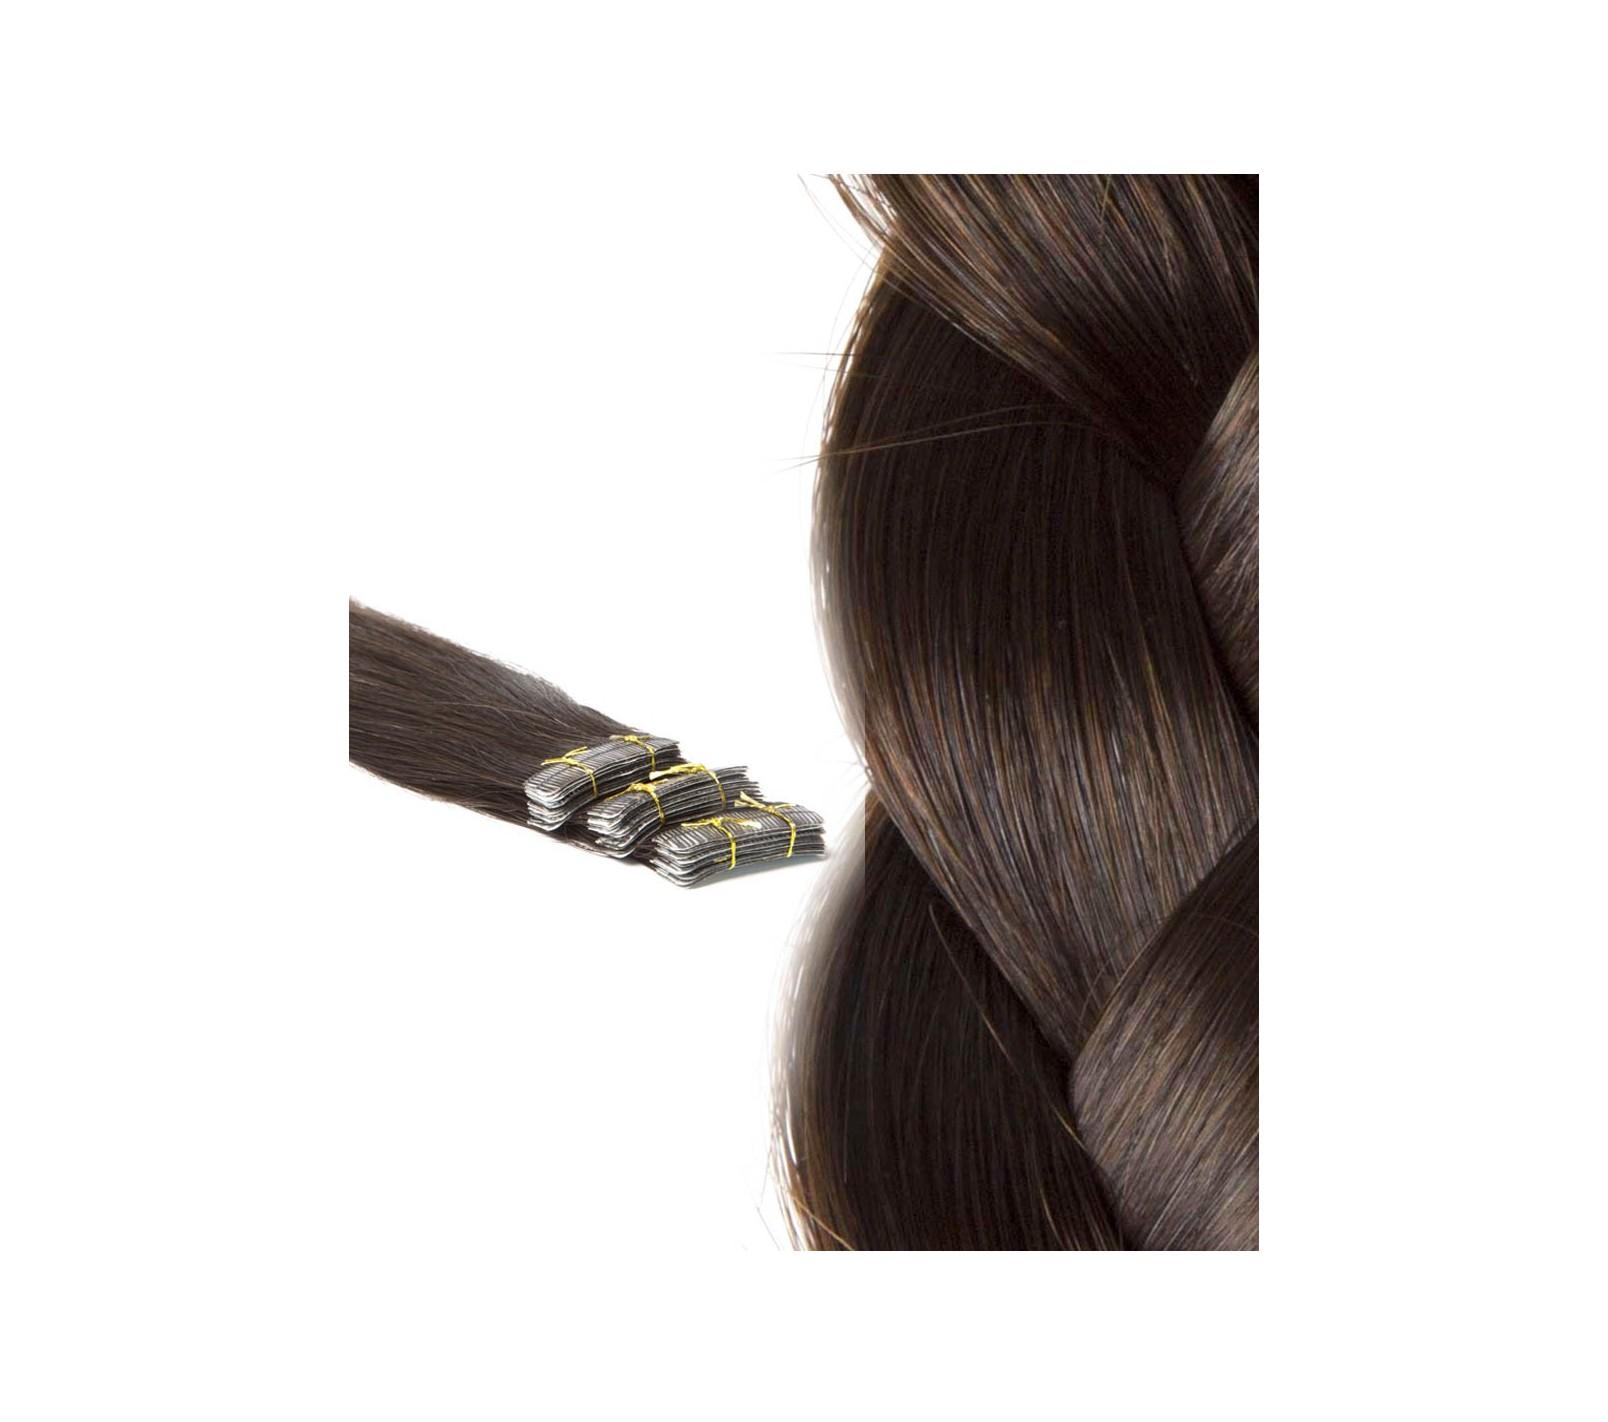 Tapes Extensions zur Haarverlngerung fr glattes Haar